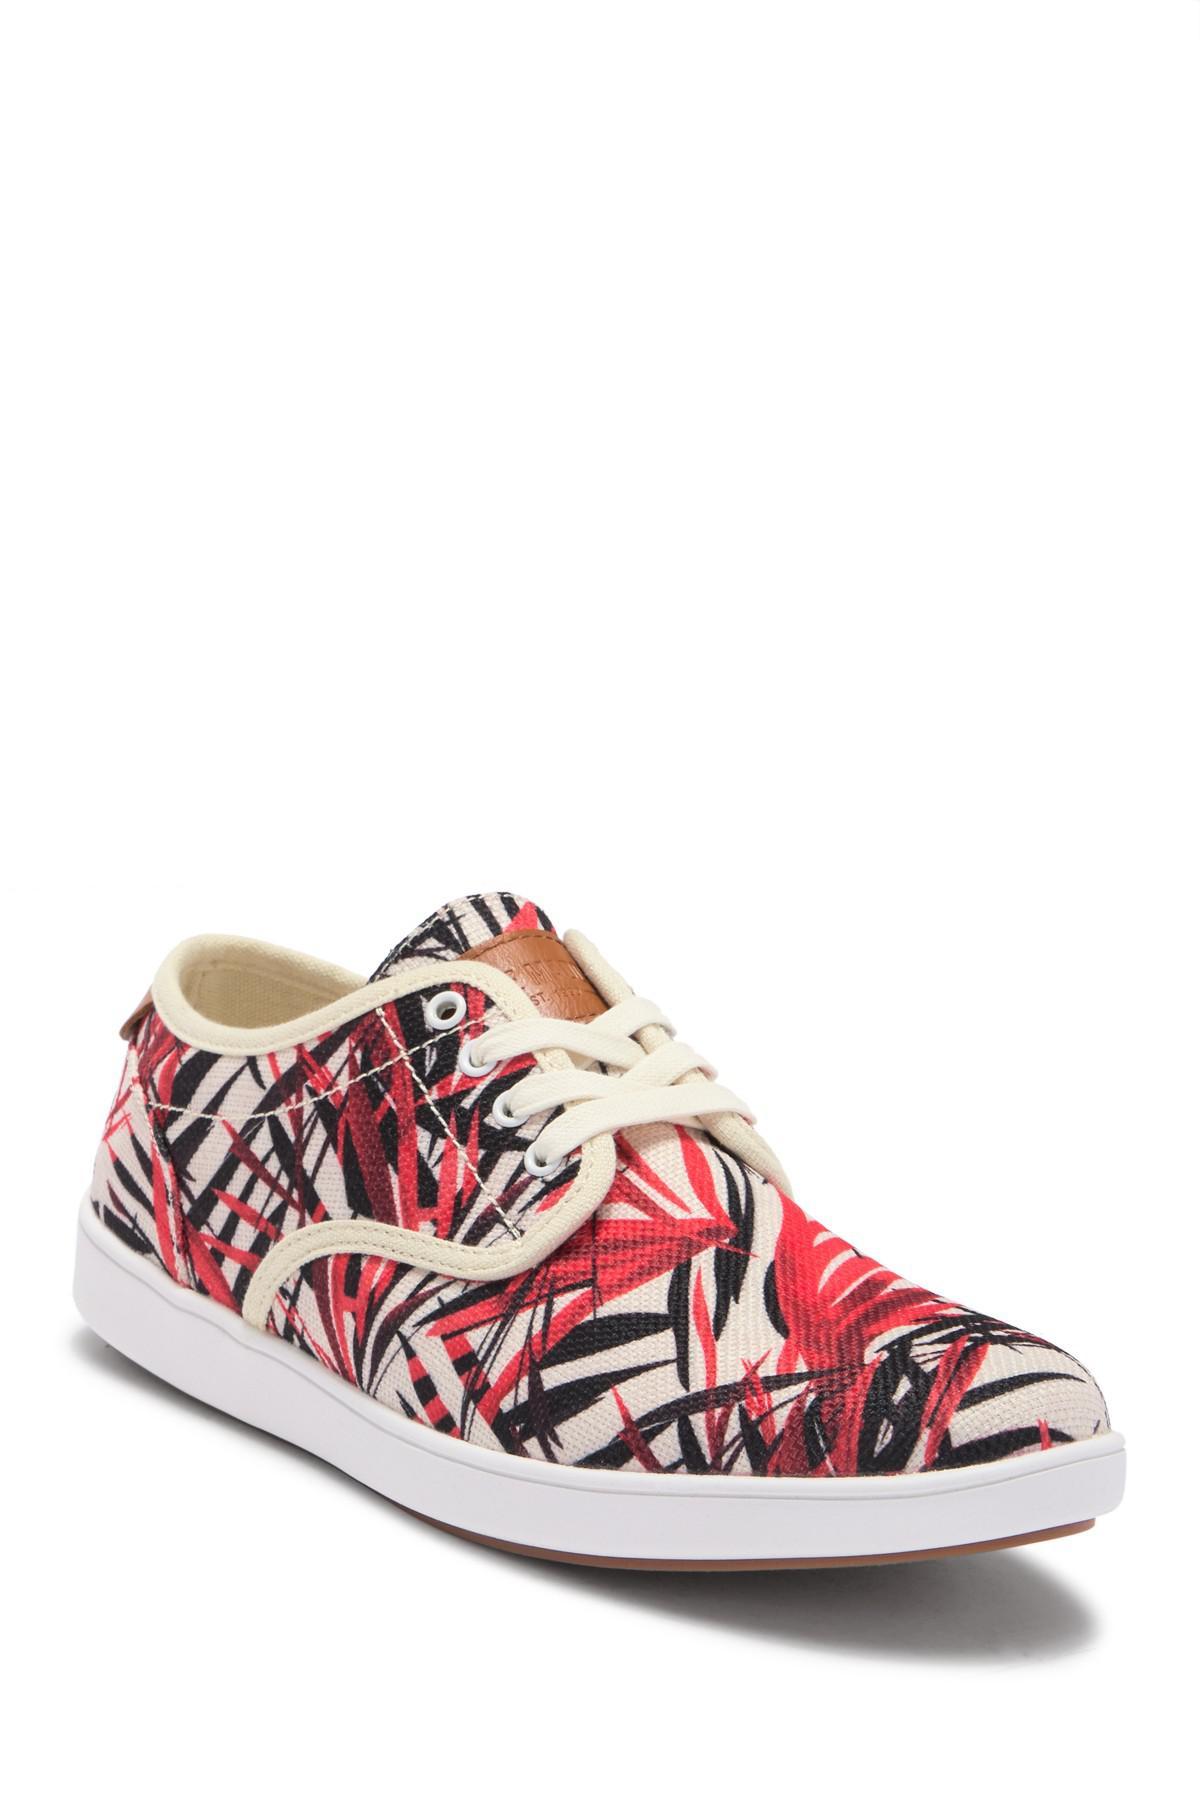 Steve Madden Floral Sport Sneaker qlSqag